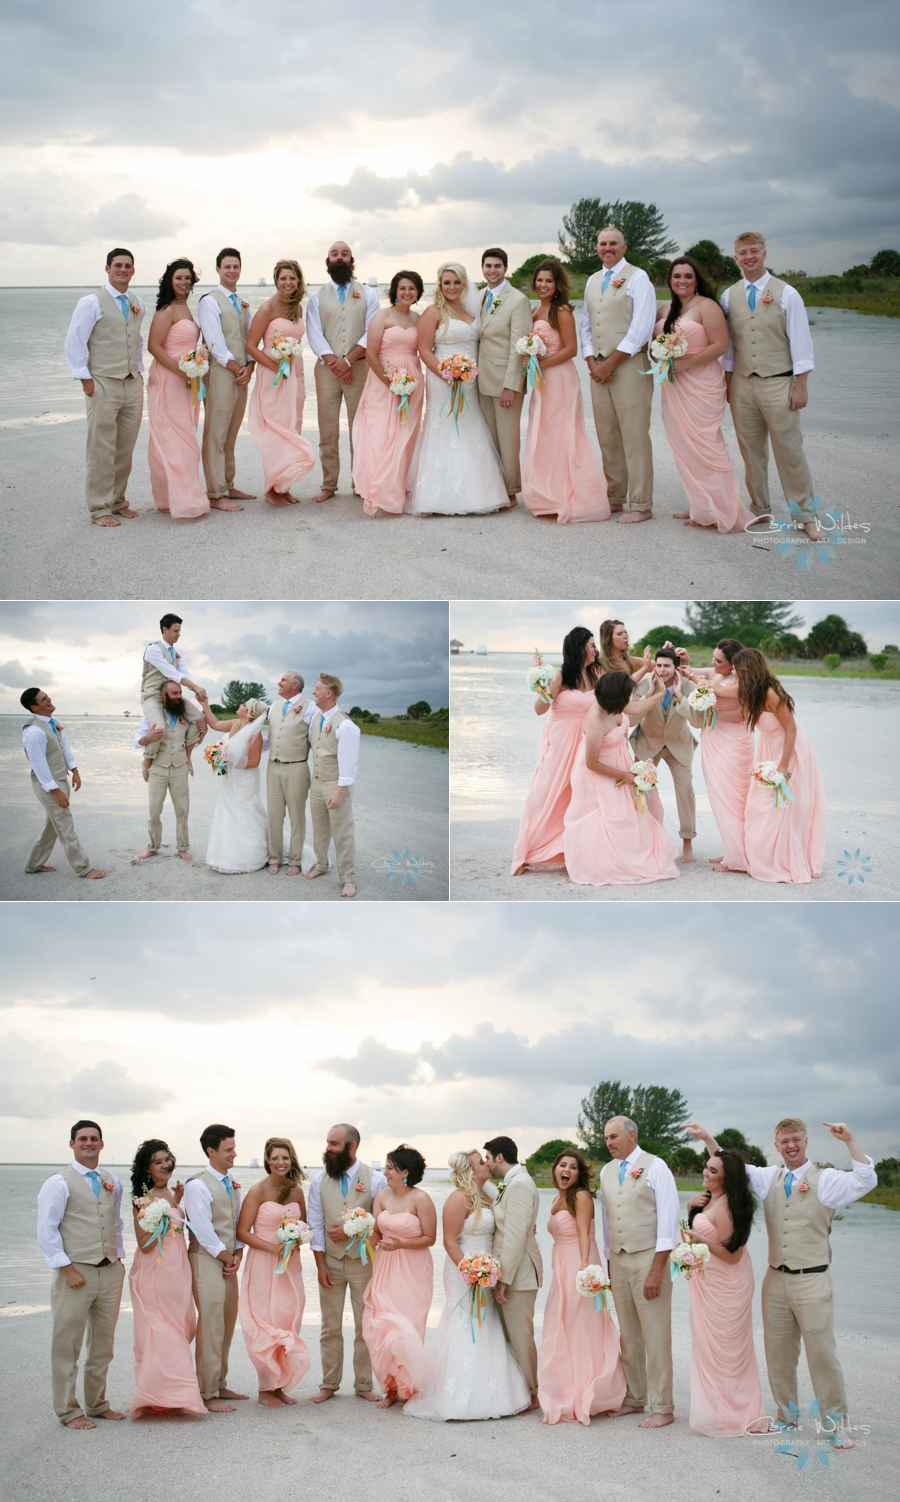 7_25_15 Sheraton Sand Key Wedding_0066.jpg